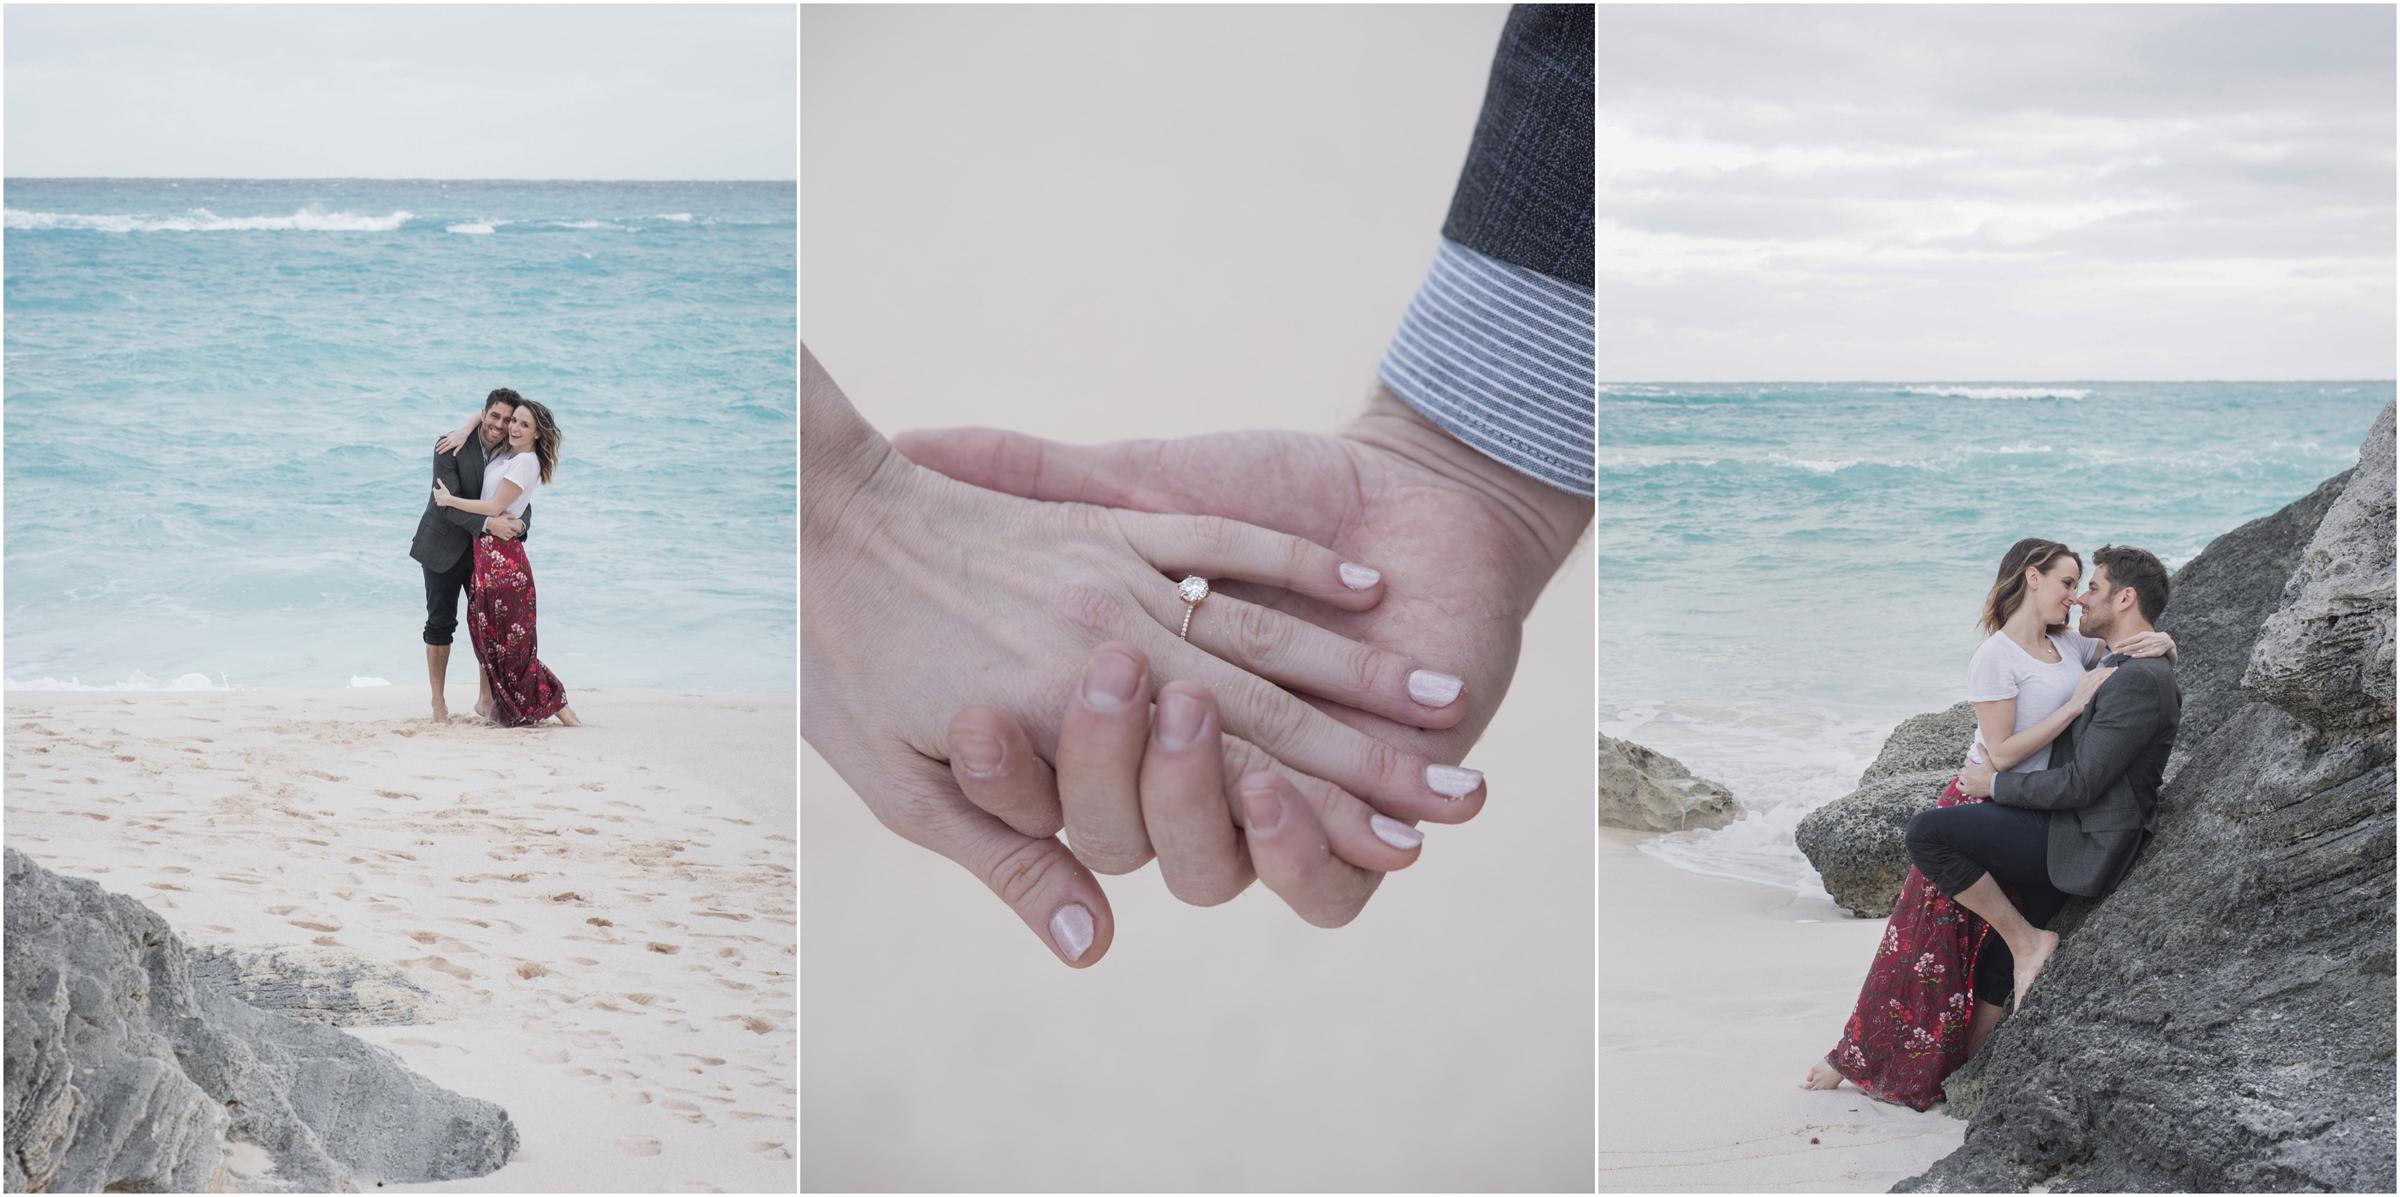 ©FianderFoto_Engagement_Josh_Emily_9.jpg